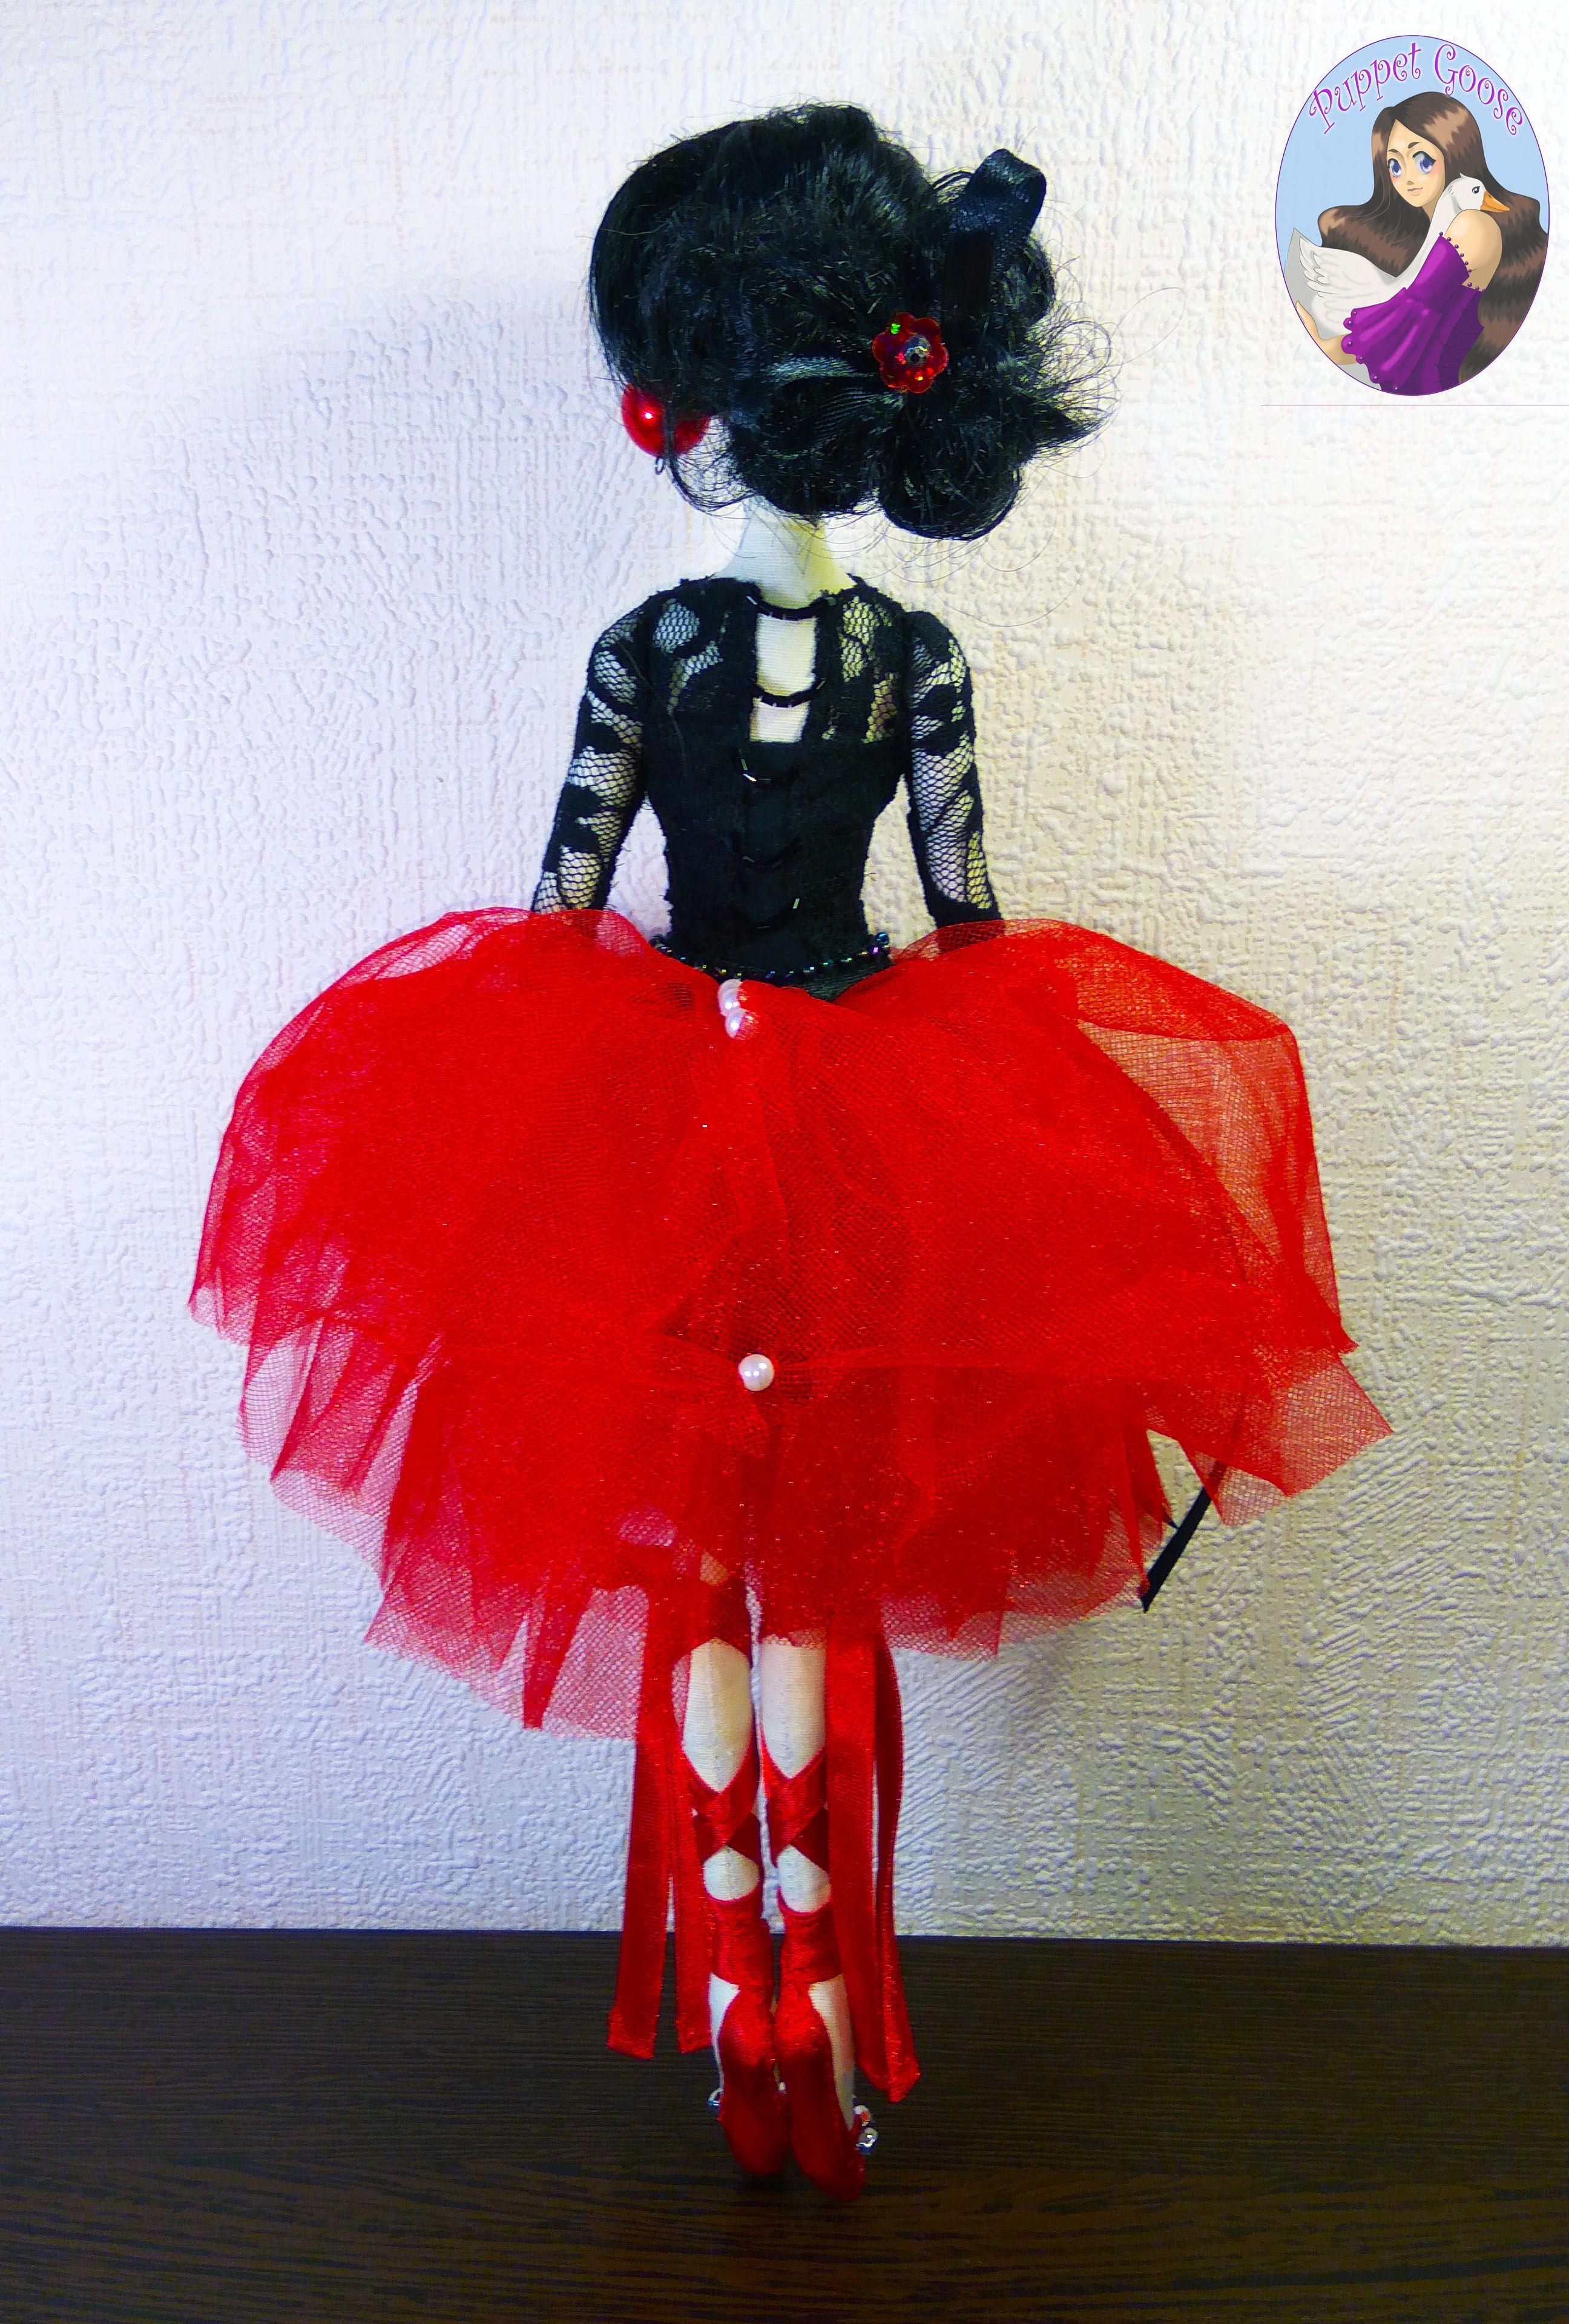 текстильная балерина кукла тряпиенс